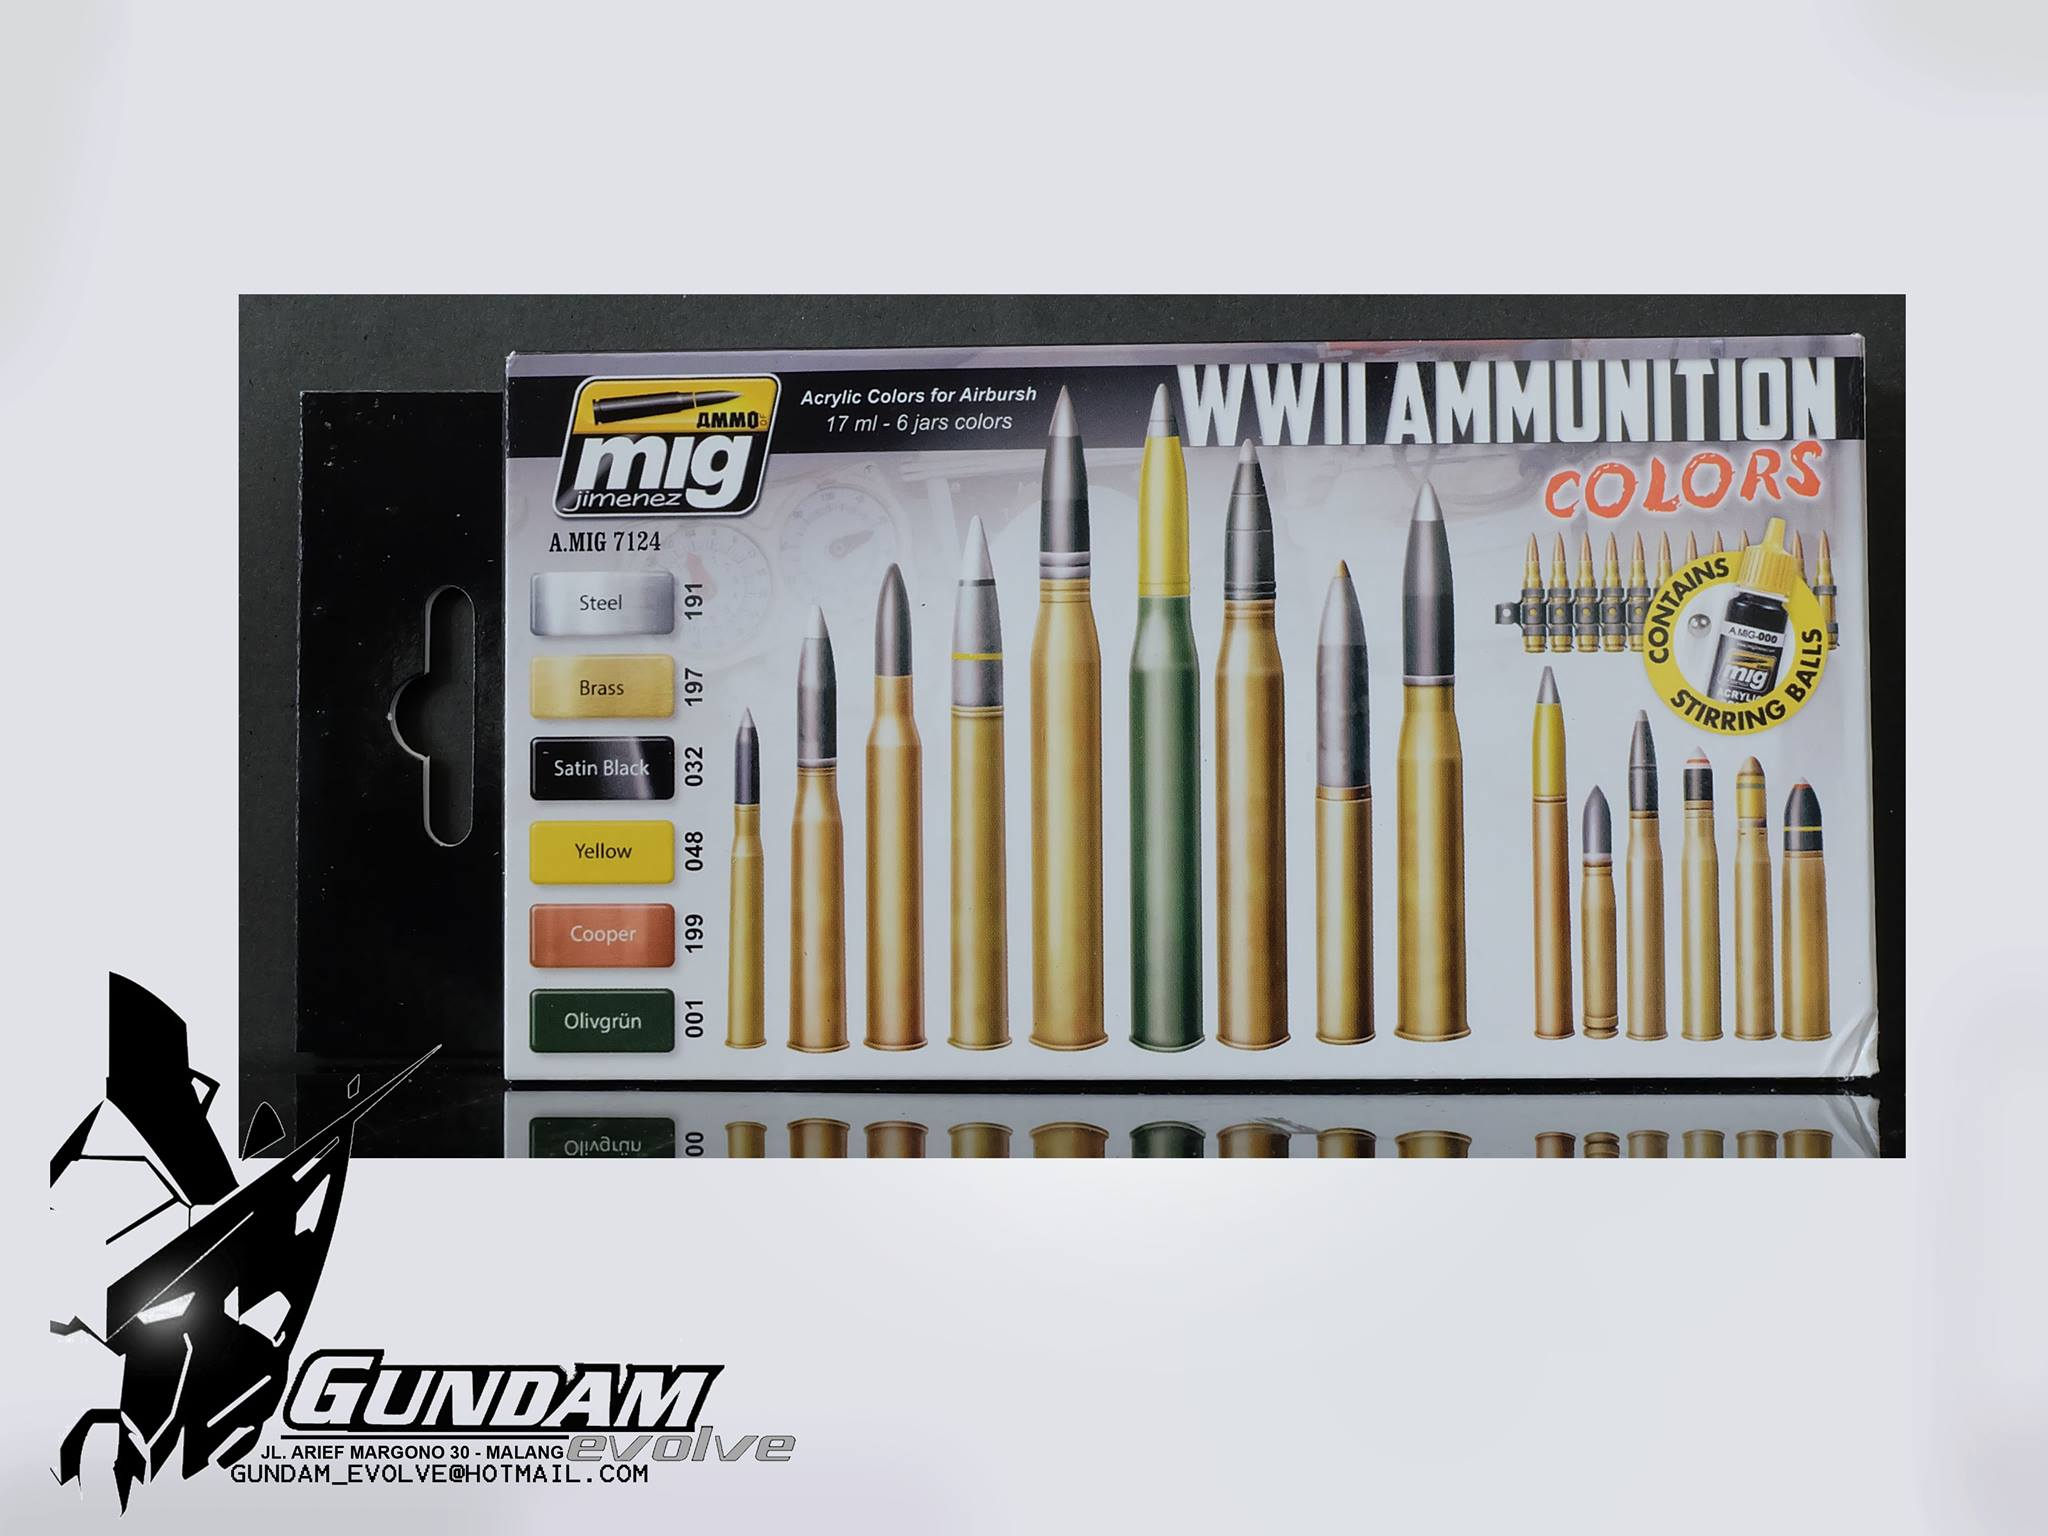 MIG Acrylic Set (6x17ml) : WWII Ammunition Colors